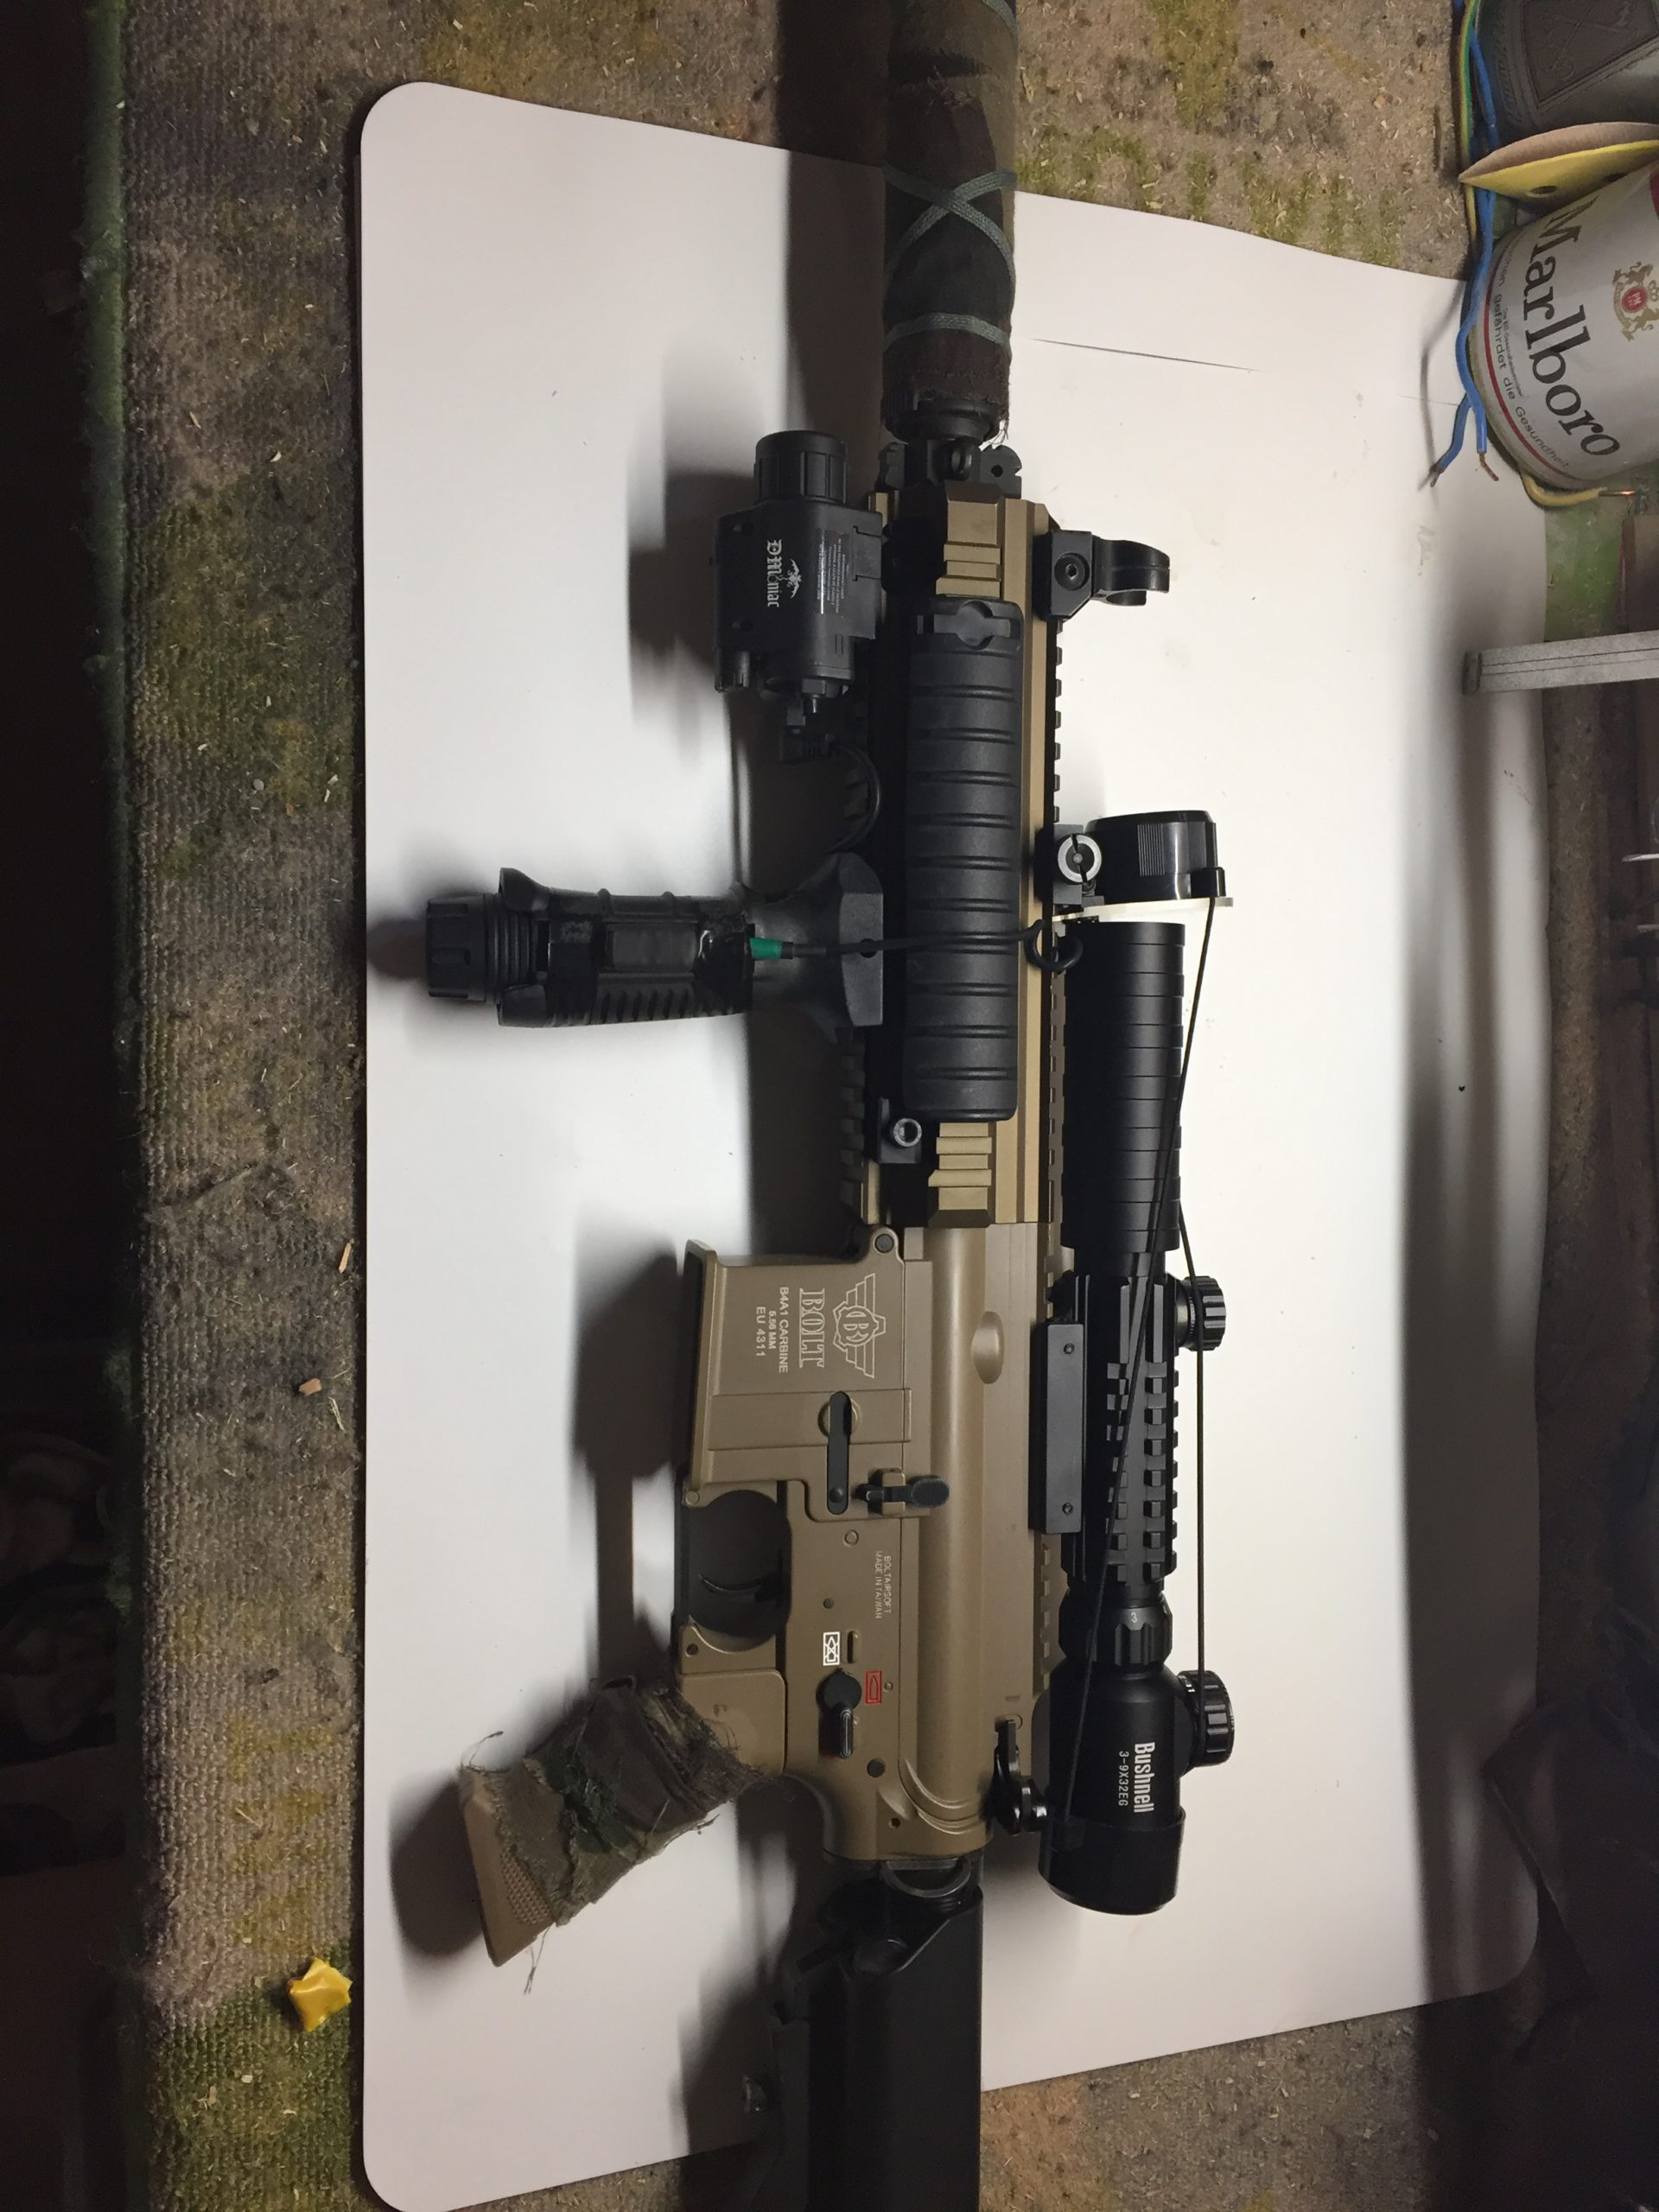 Vends HK 416  bolt   devgru